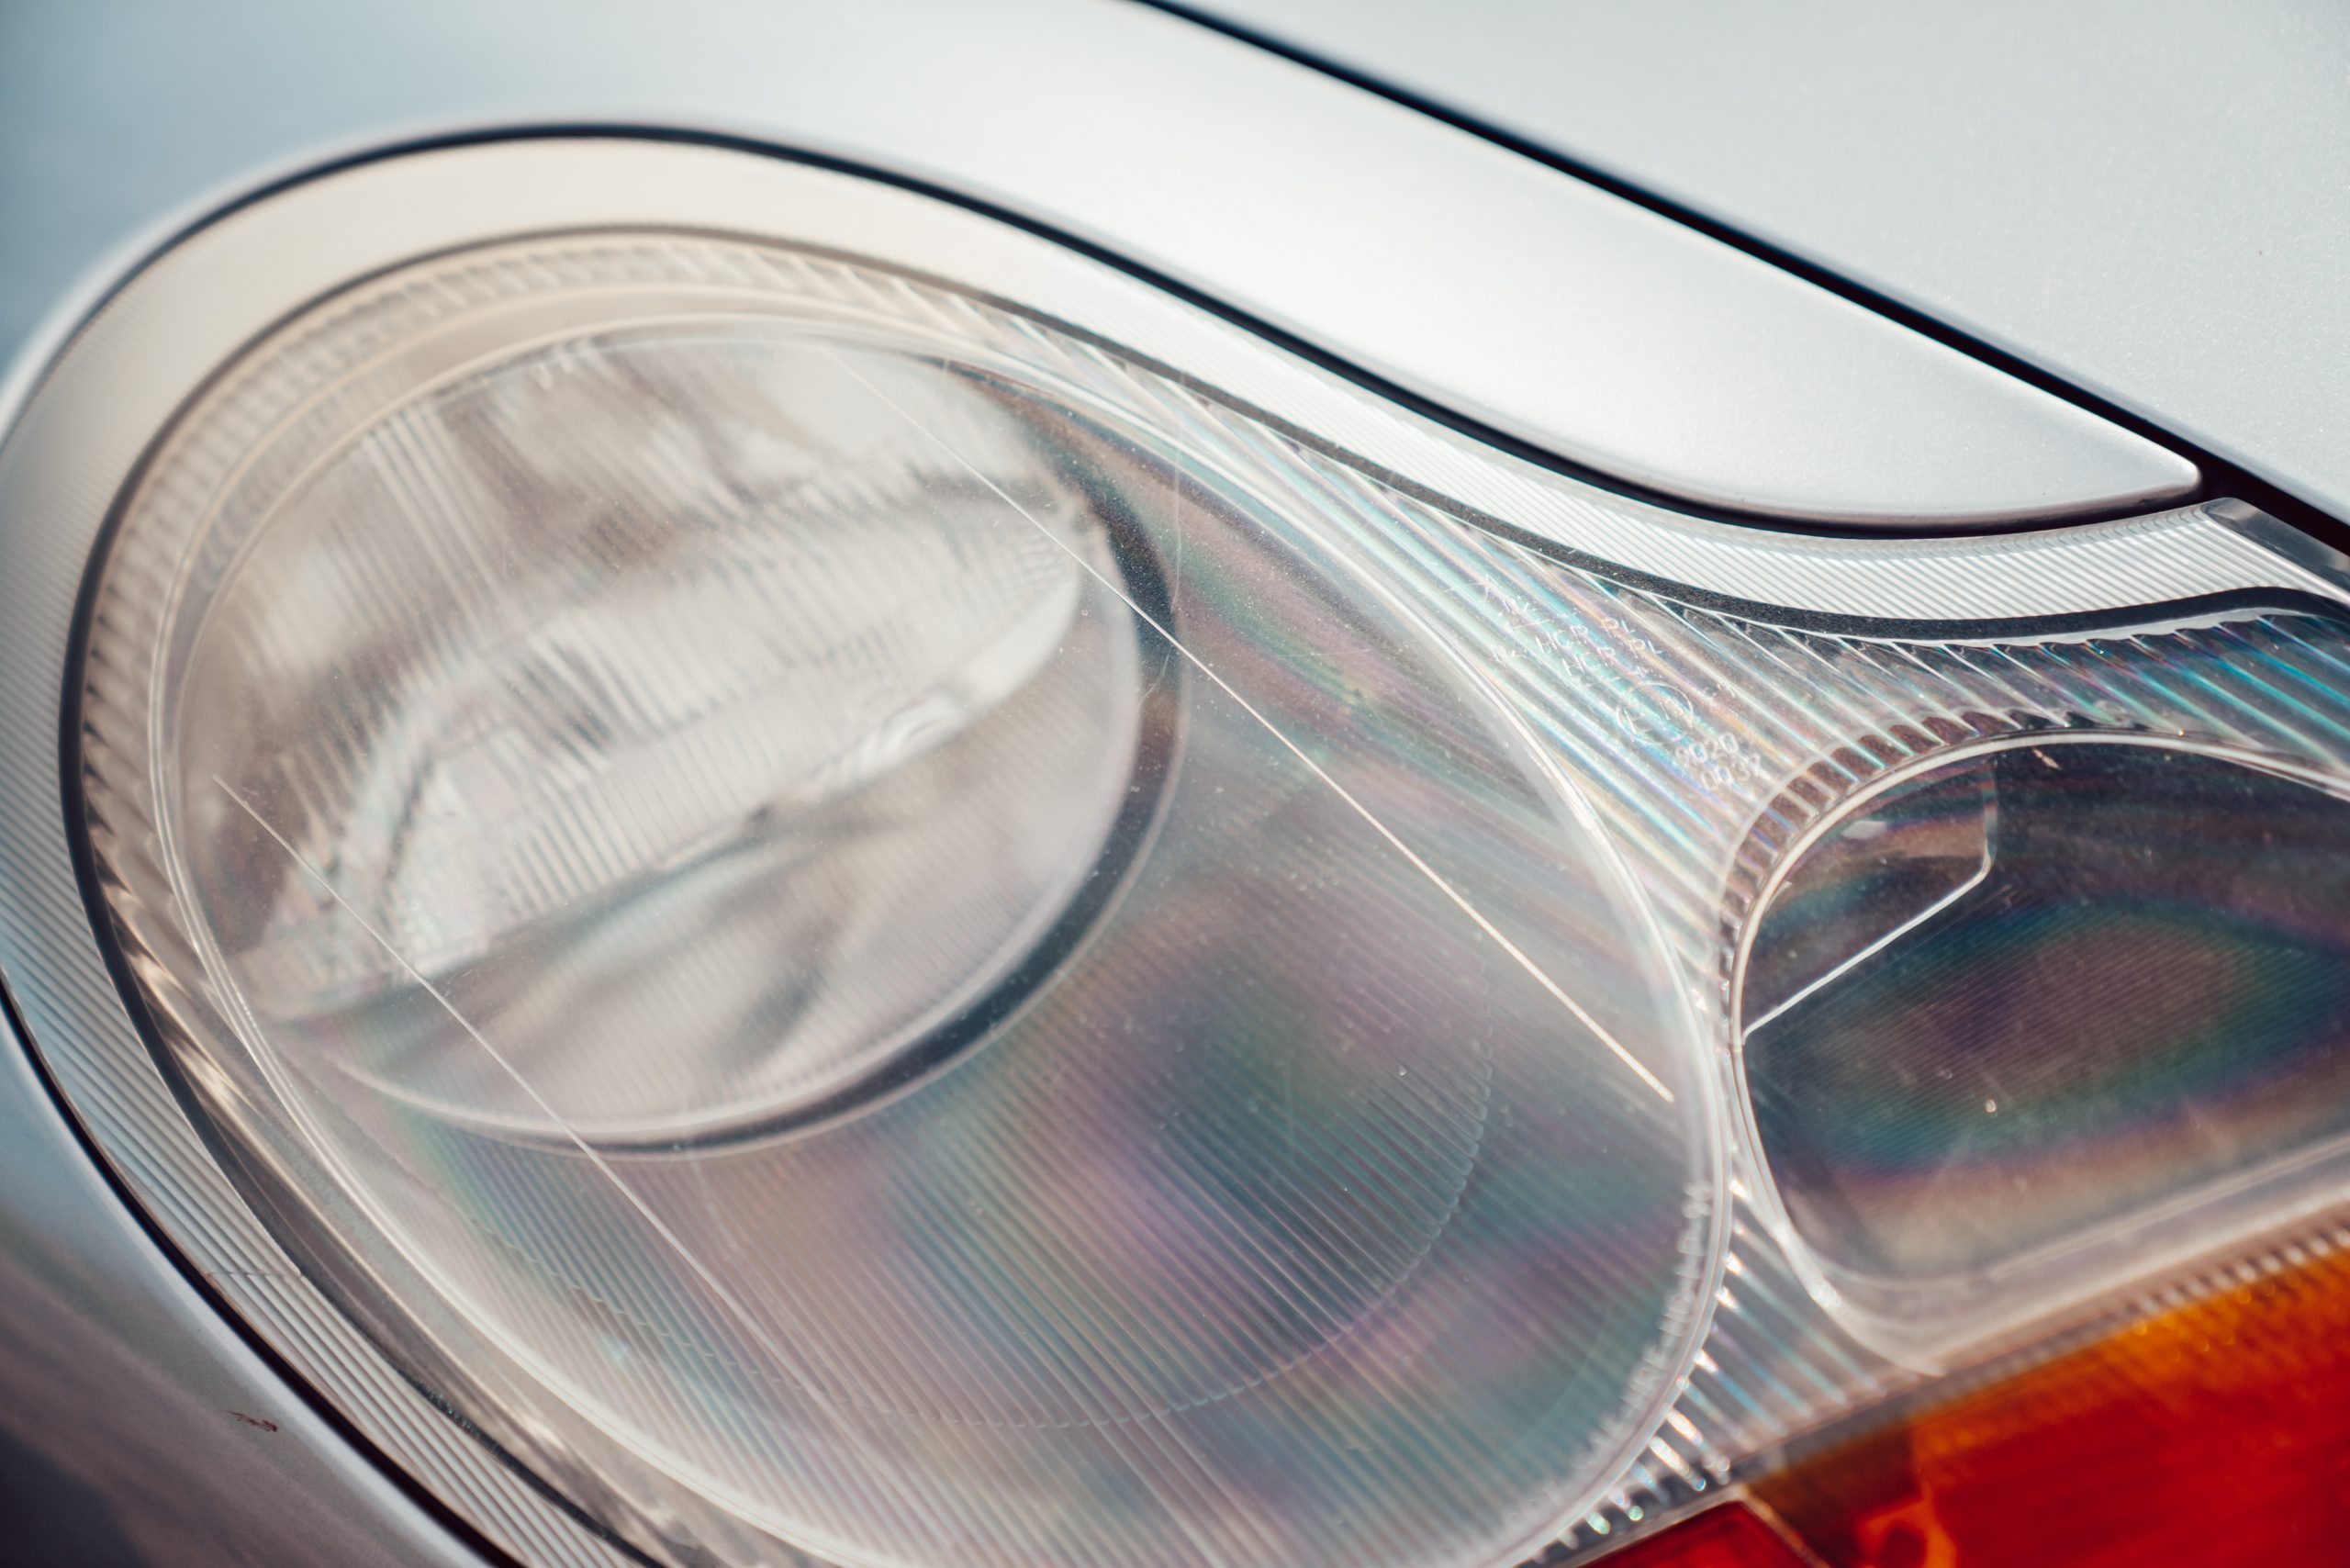 Porsche Boxster 986 headlamp cluster